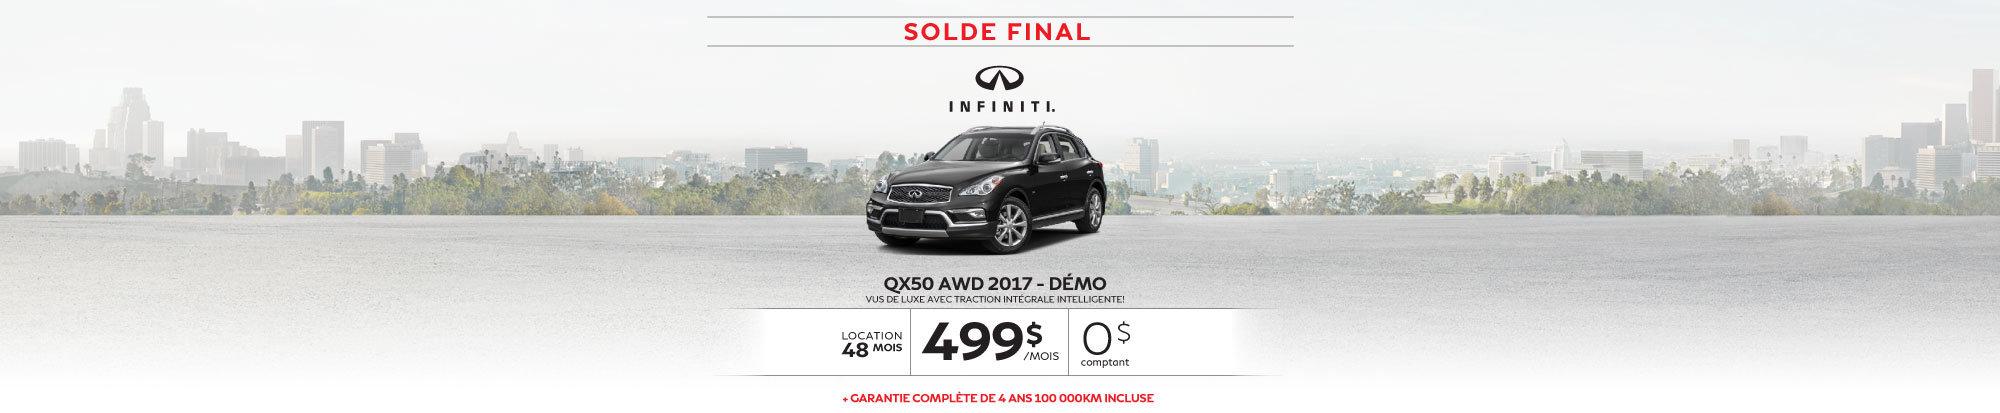 SOLDE FINAL QX50 AWD 2017 - Démo web